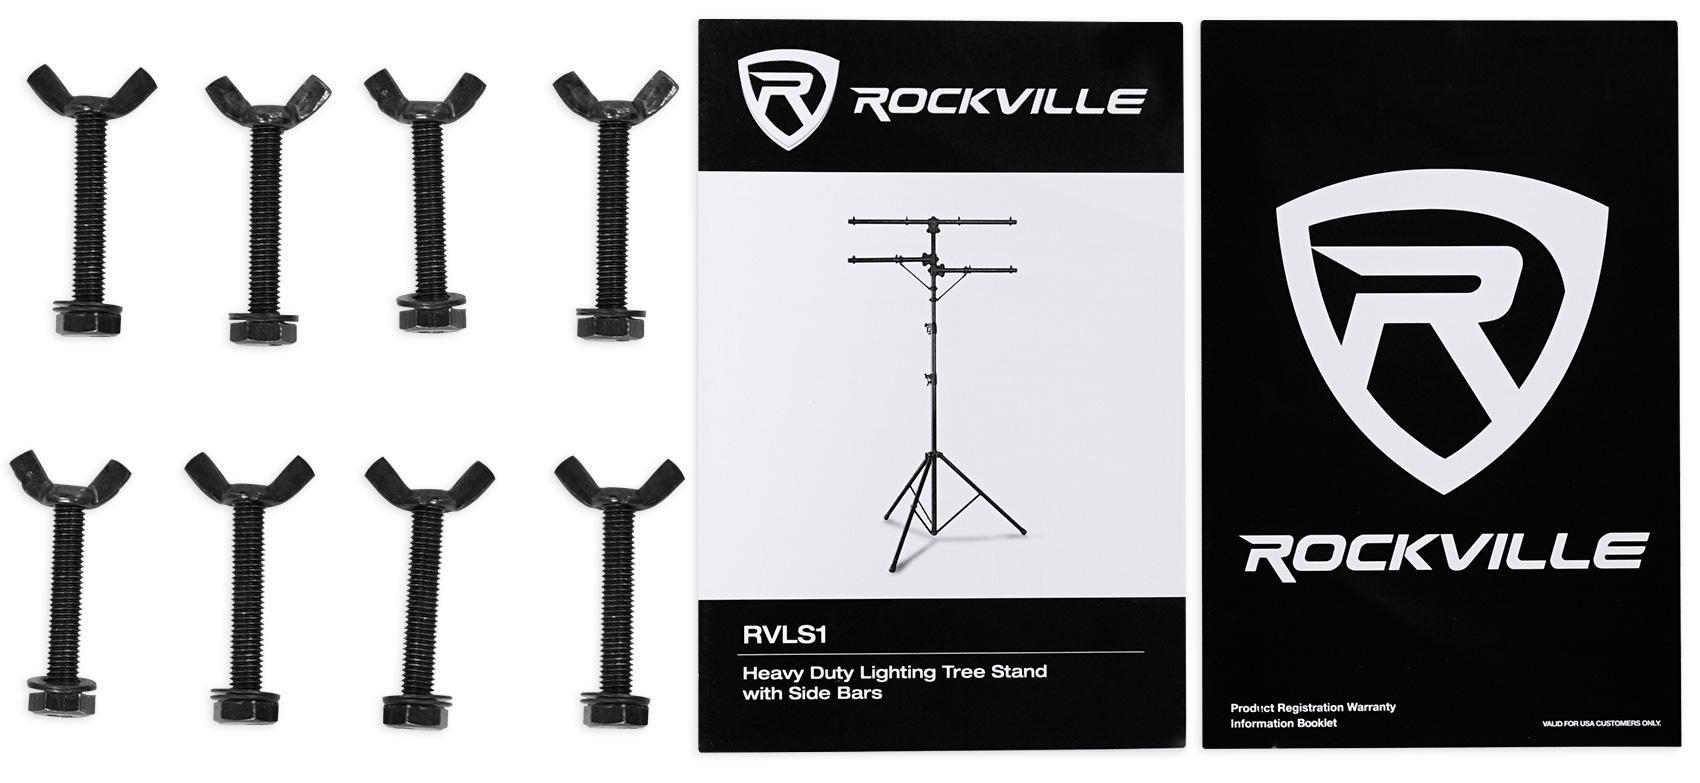 View larger  sc 1 st  Amazon.com & Amazon.com: Rockville RVLS1 12u0027 Ft Tripod Lighting Tree Stand w ... azcodes.com